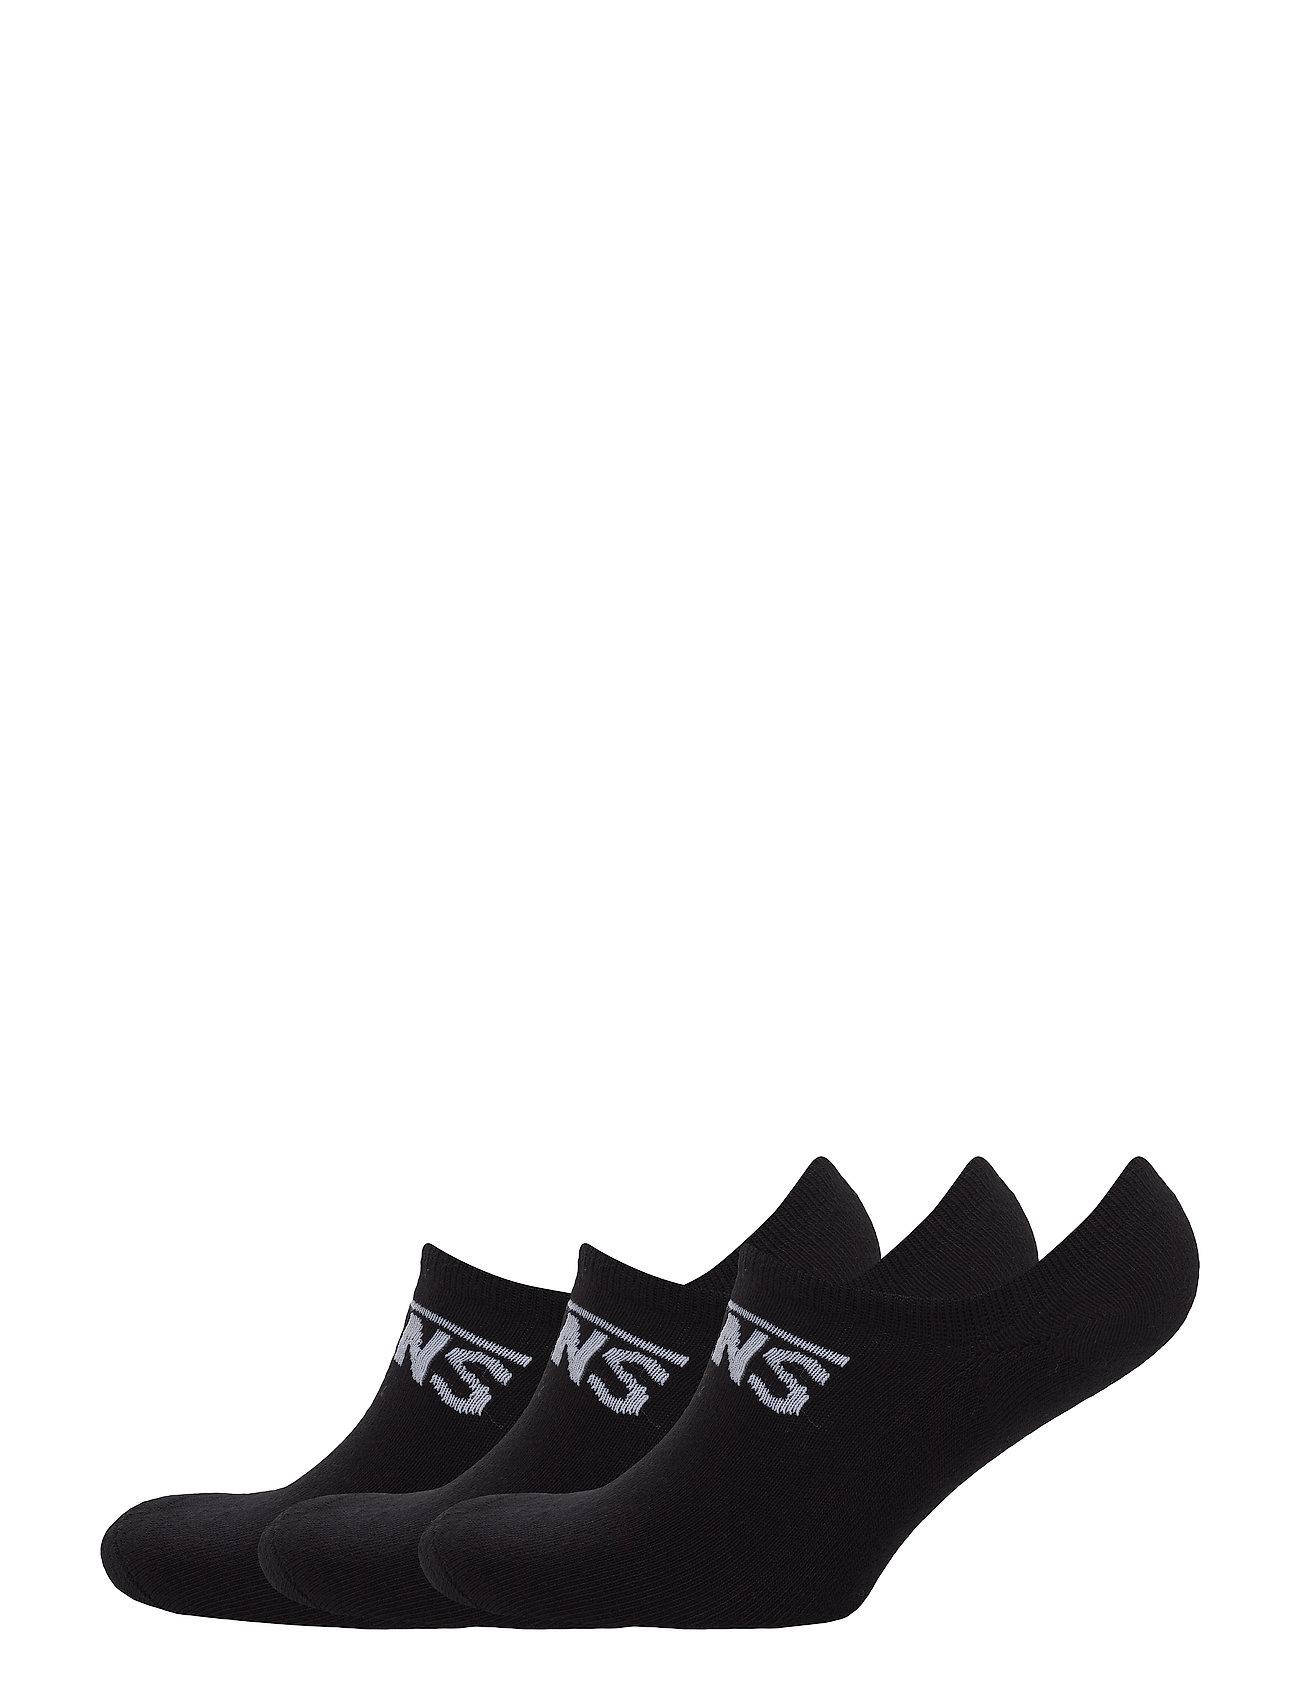 VANS CLASSIC KICK BOYS (1-6, 3PK) - BLACK